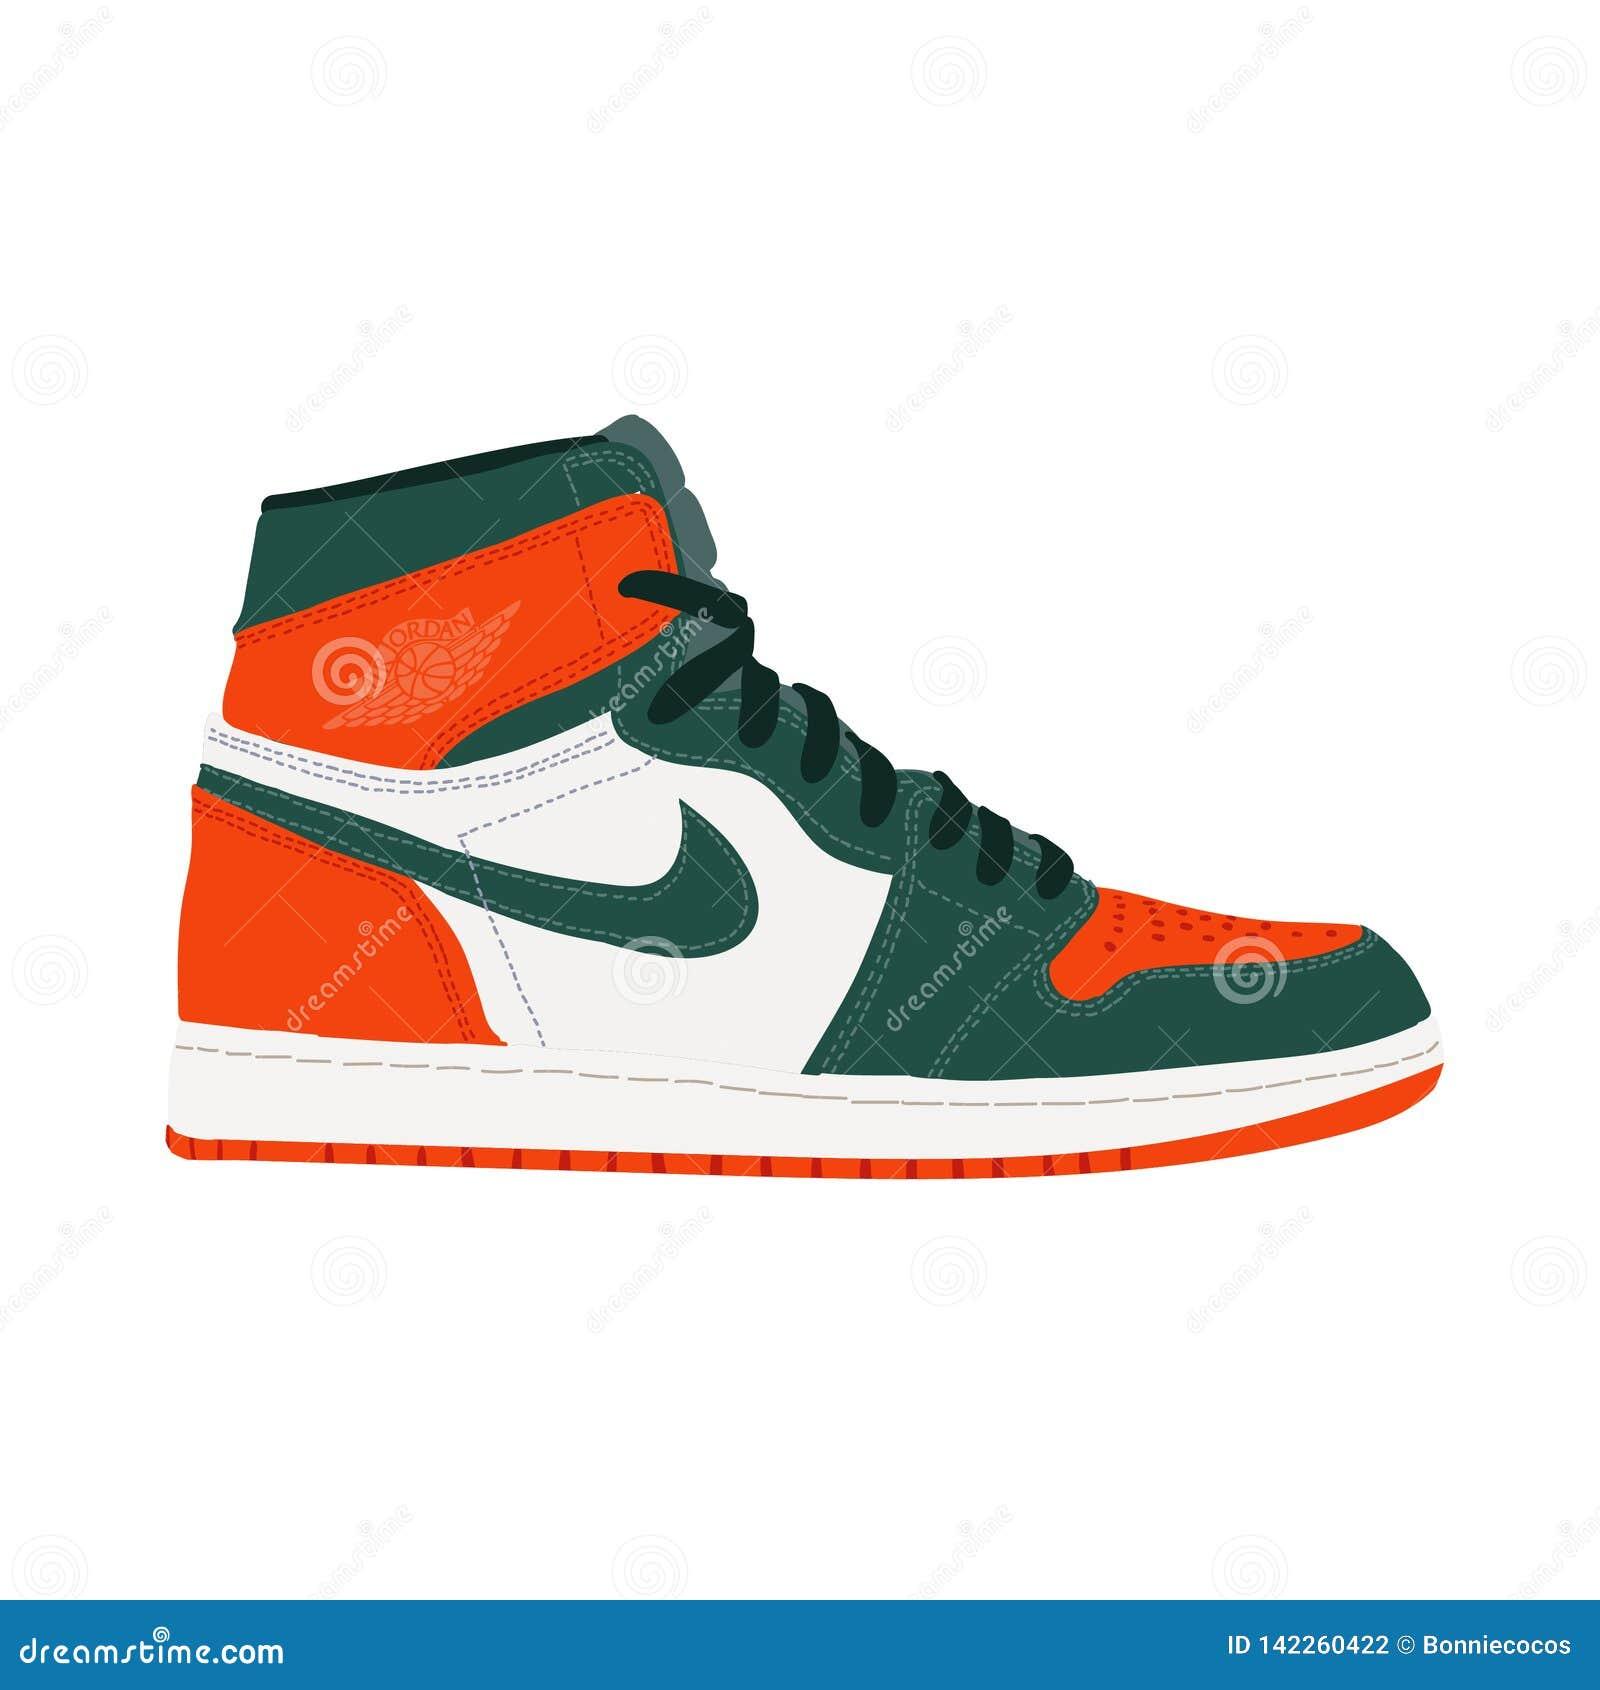 San Francisco ee4b2 a1406 Nike Air Jordan Espadrille Avion-école Conception Plate ...